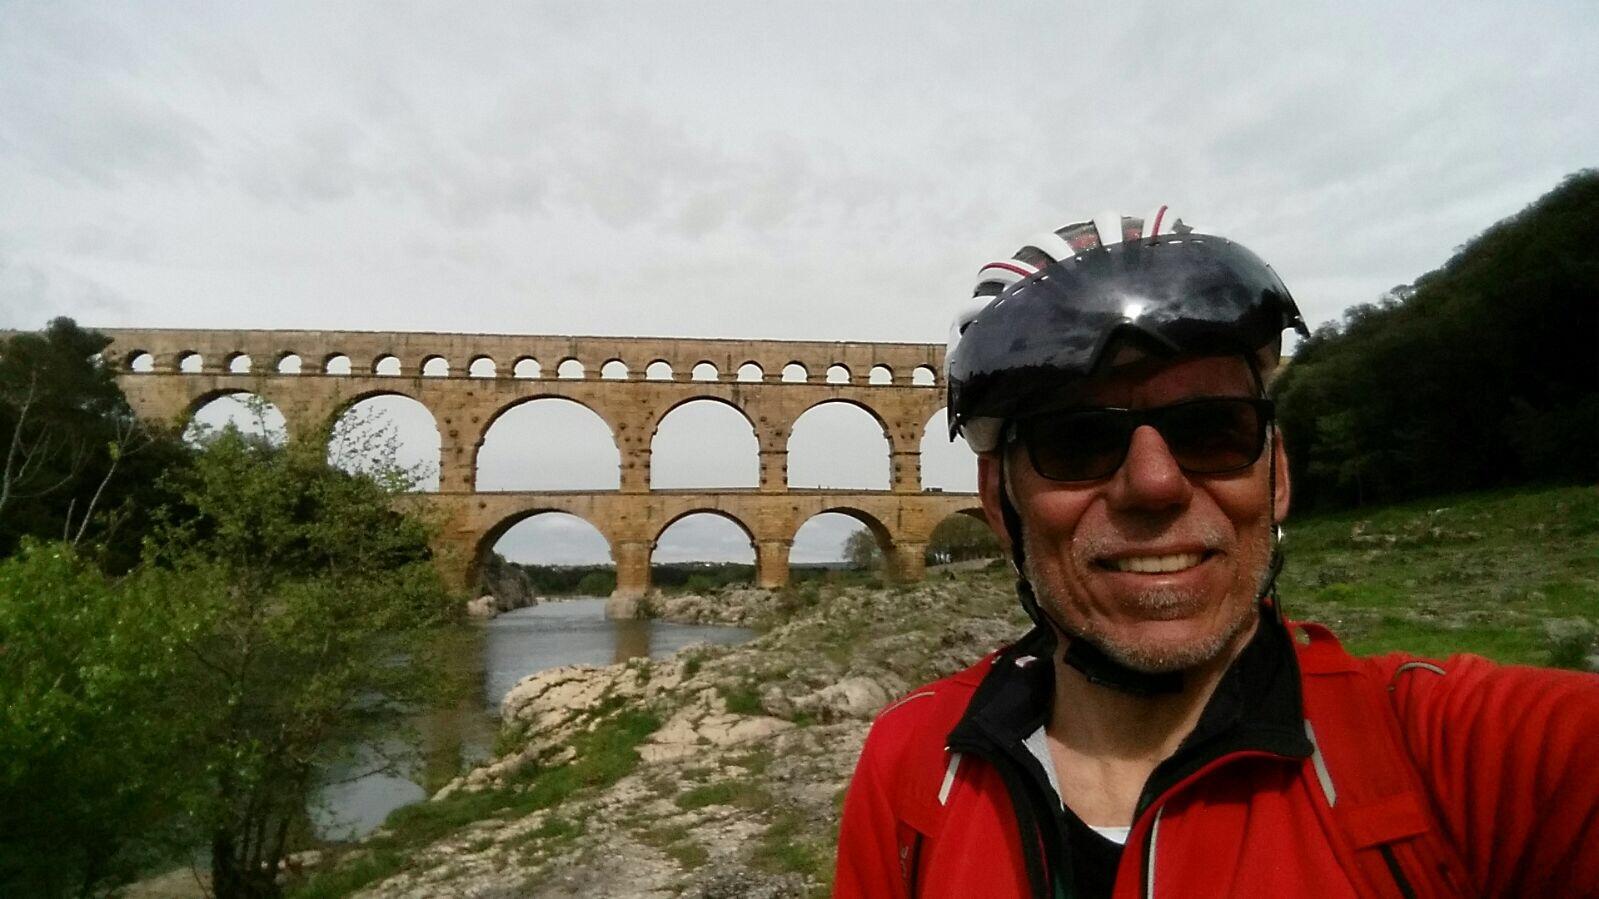 Lutz-bei-Pont-du-Gard-bei-Nimes